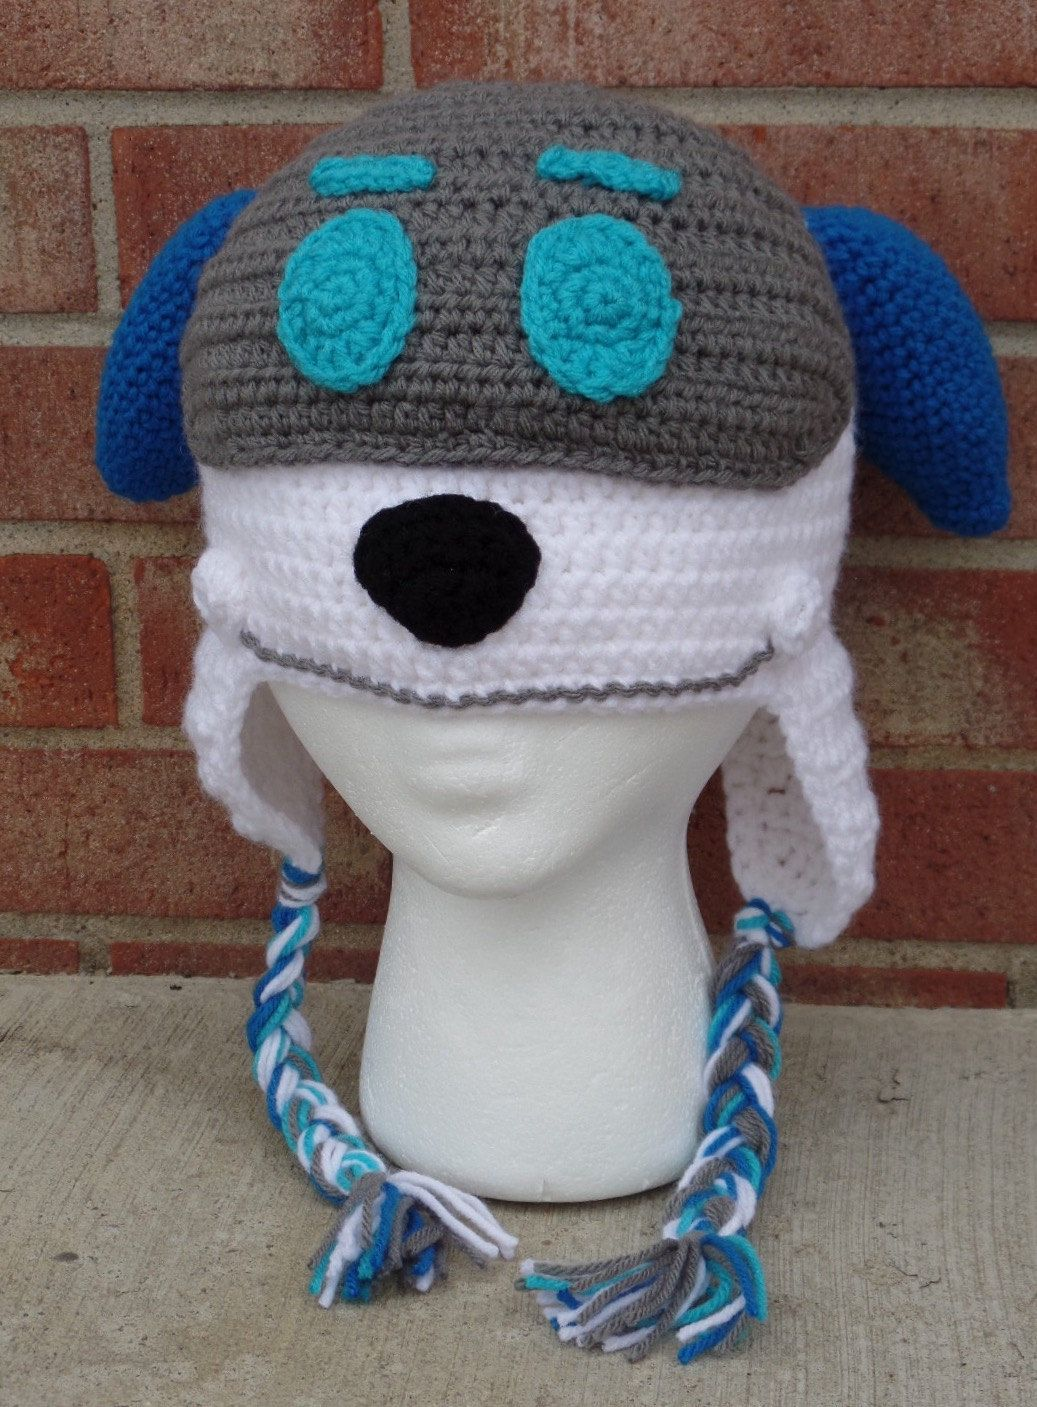 Robot Dog Crochet Hat; Paw Patrol Robo Dog Inspired Hat by ...